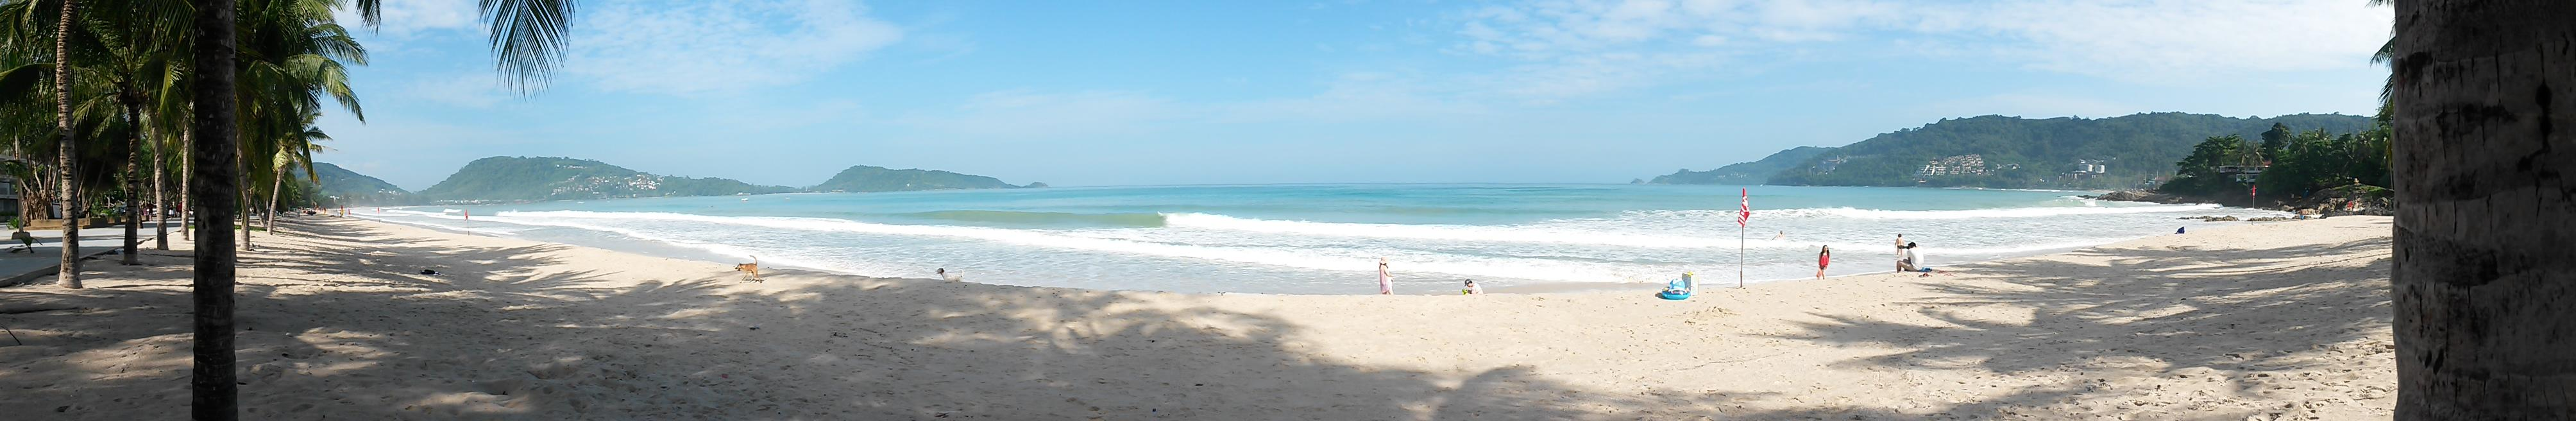 Веб камеры пхукета онлайн пляж